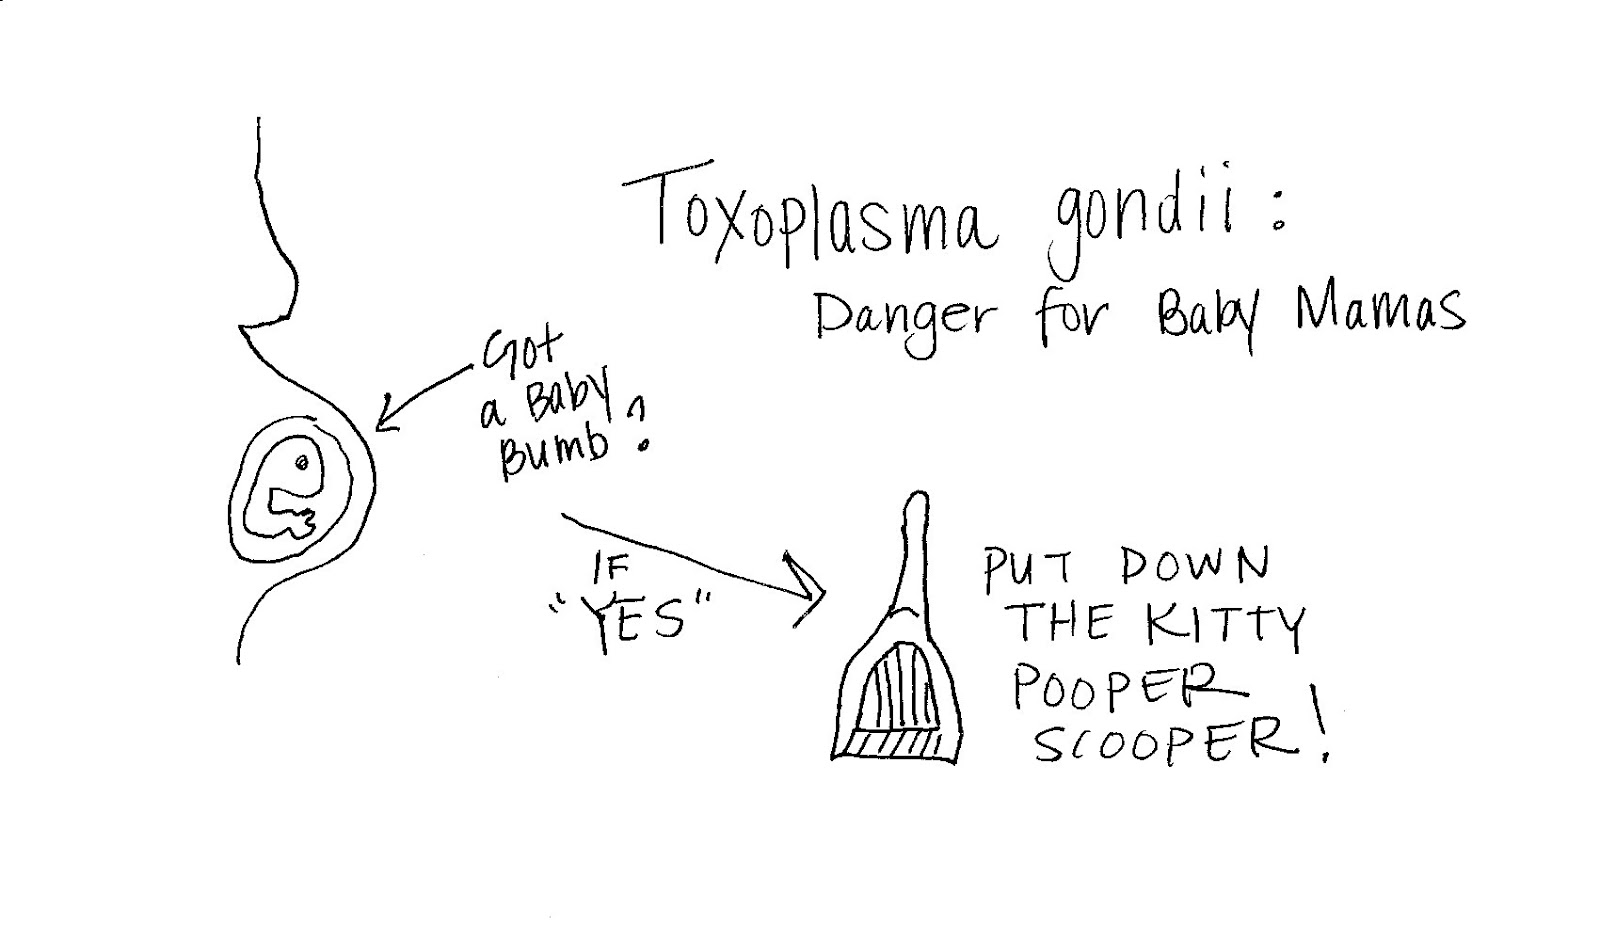 Toxoplasmosis in pregnant women